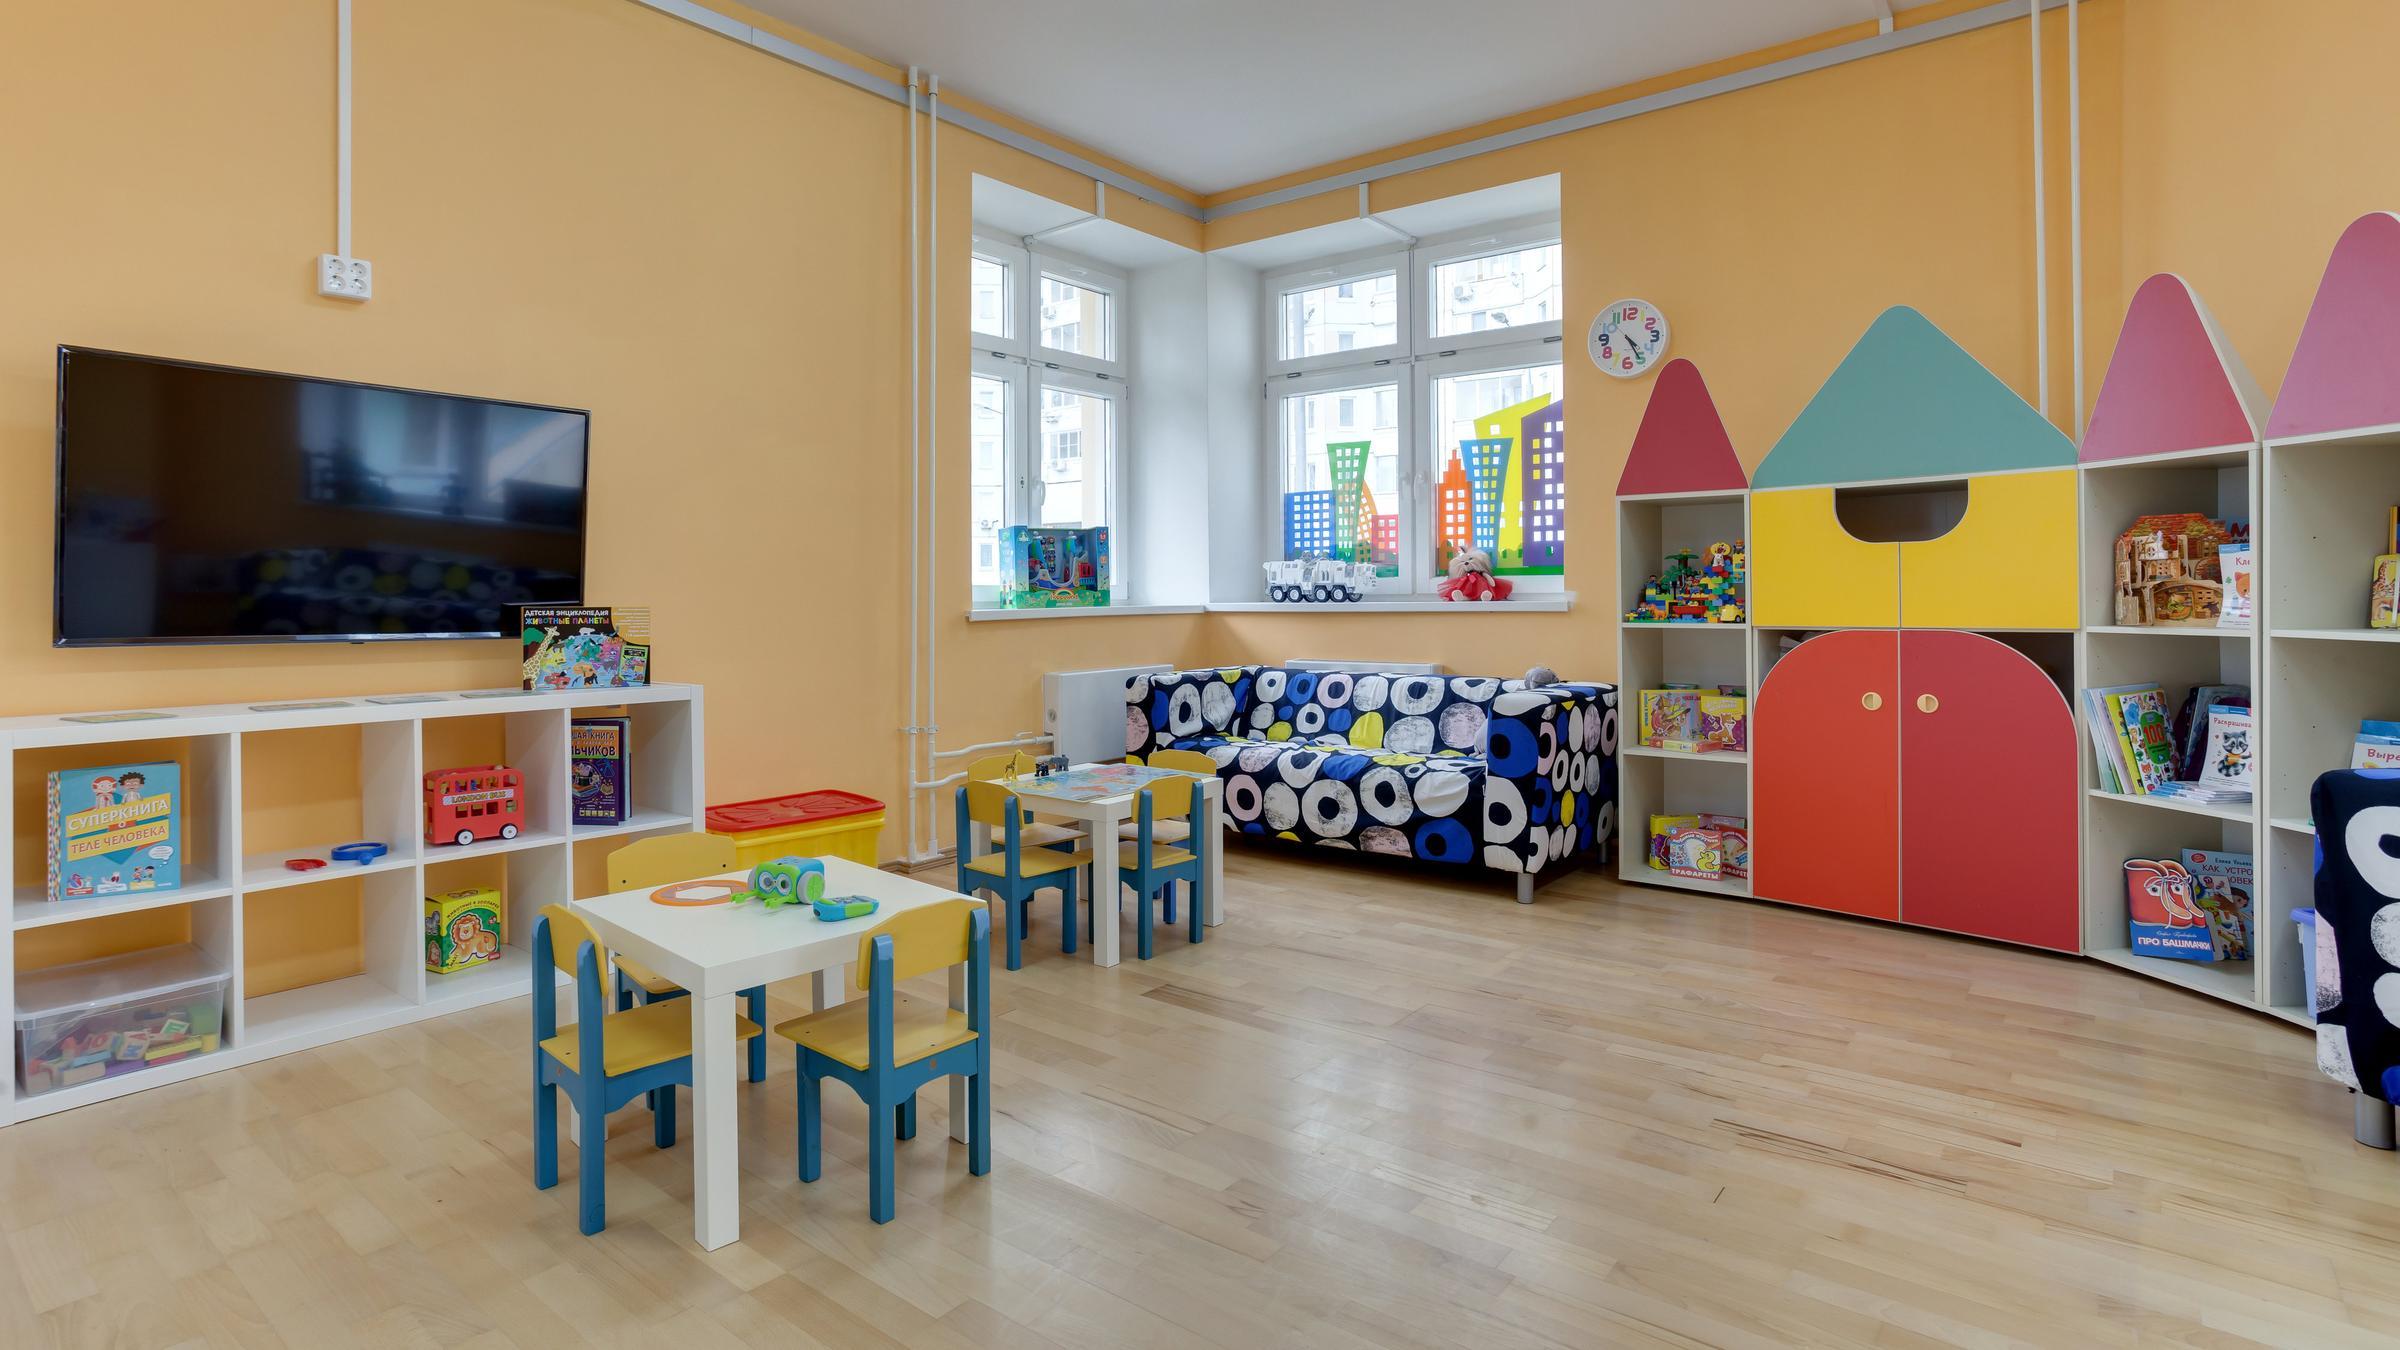 фотография Частного детского сада IQ-college Взмах